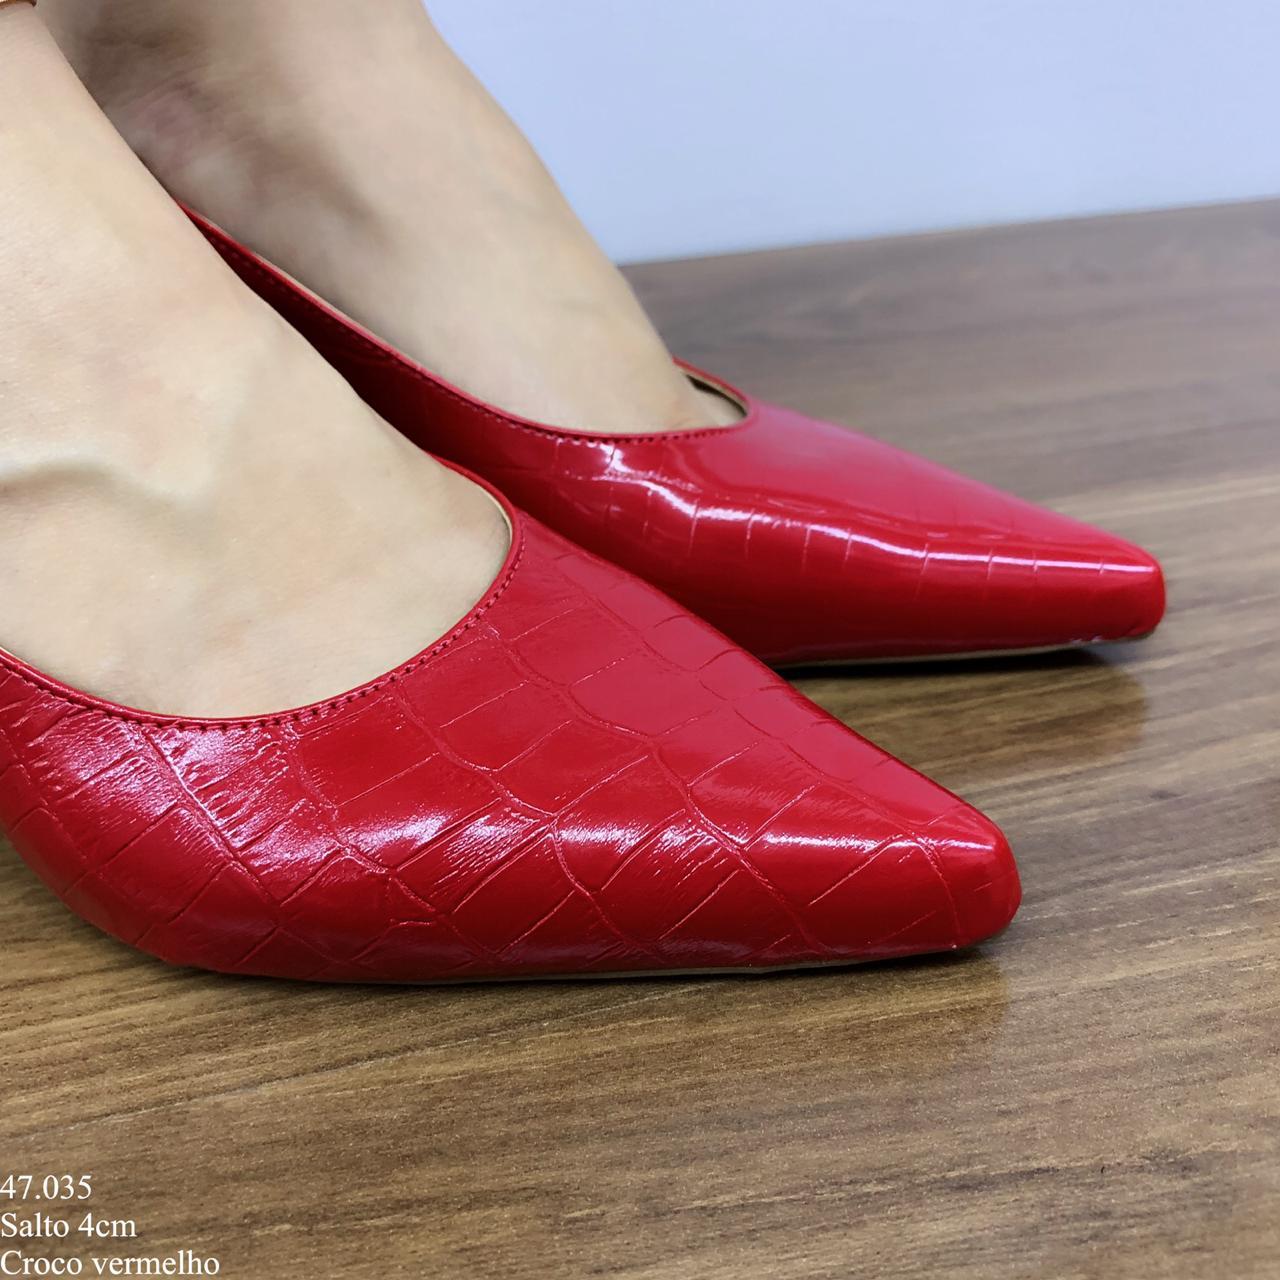 Scarpin Chanel Vermelho Croco   D-47.035